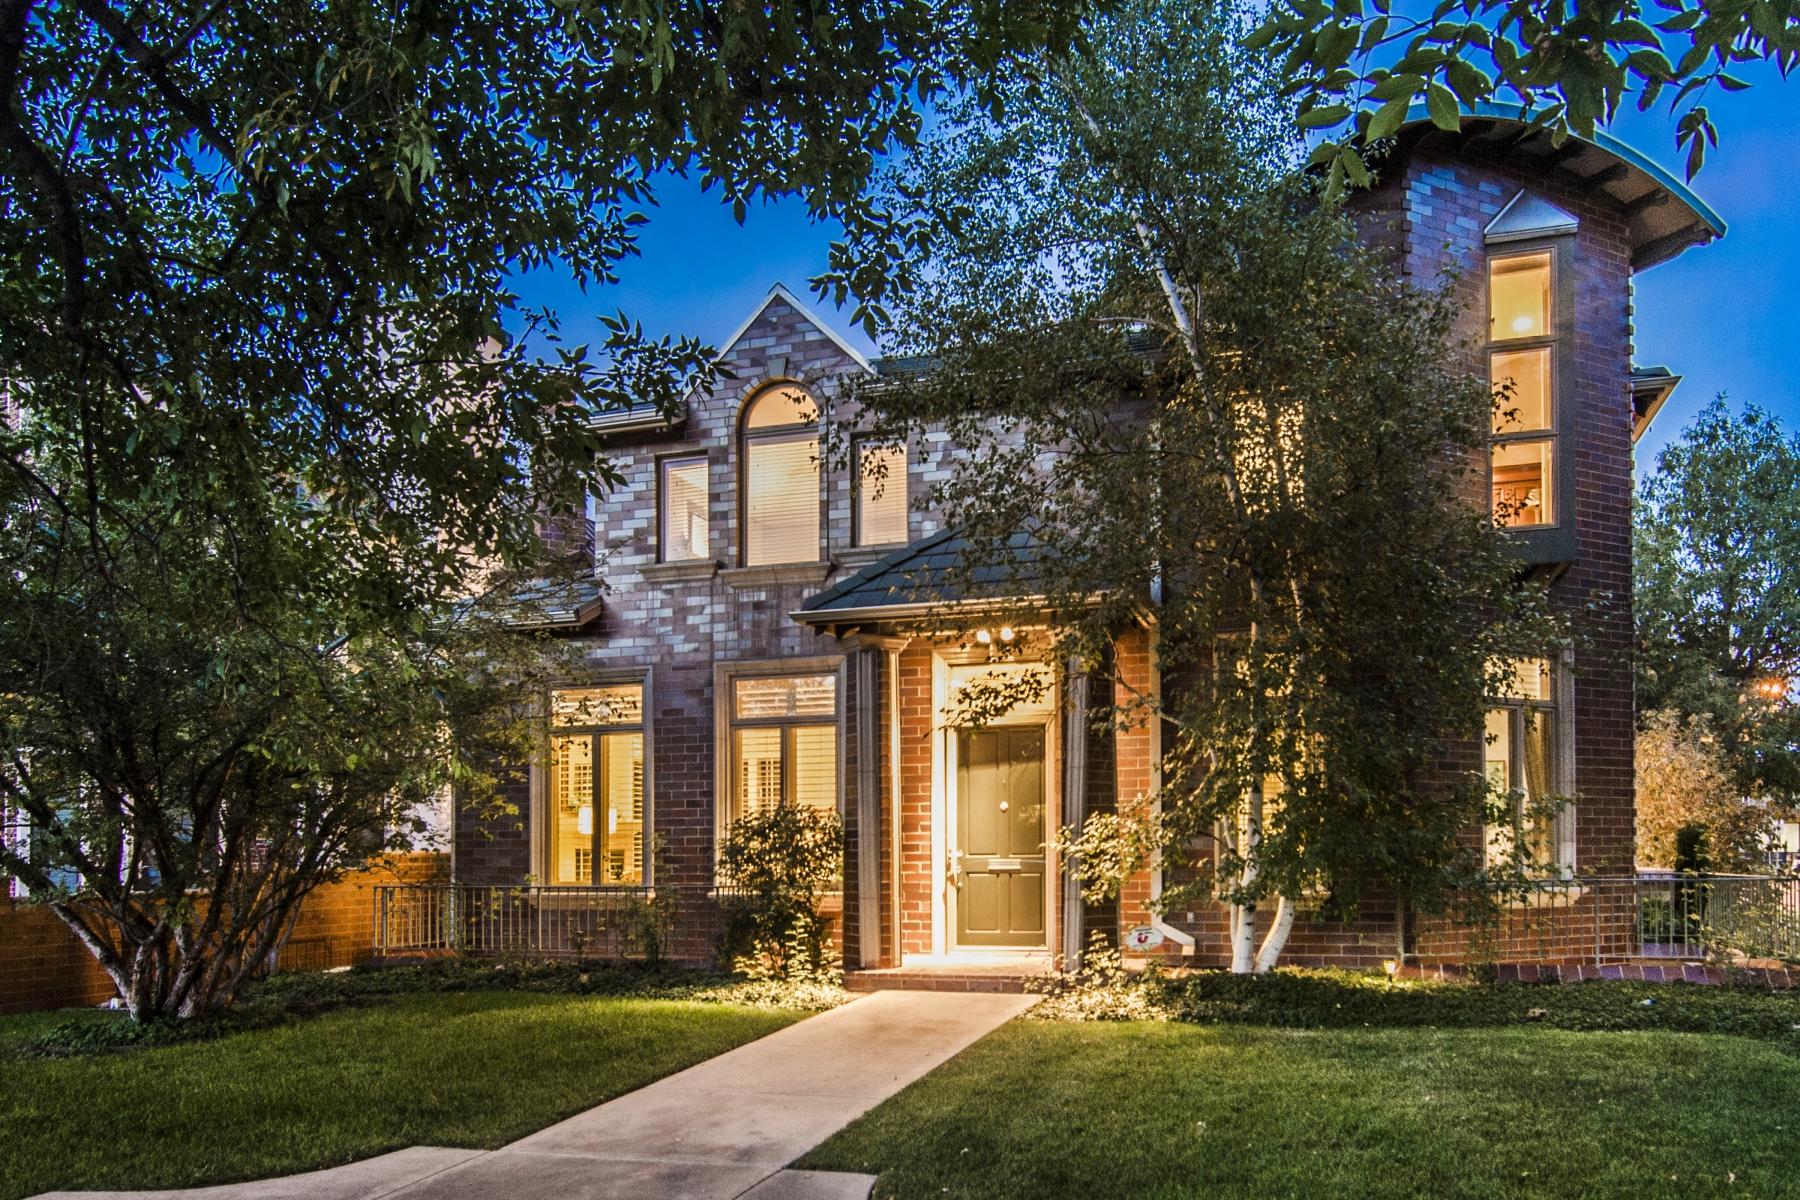 Single Family Home for Sale at Custom Jonathan Saiber Home 400 Clayton Street Denver, Colorado 80206 United States